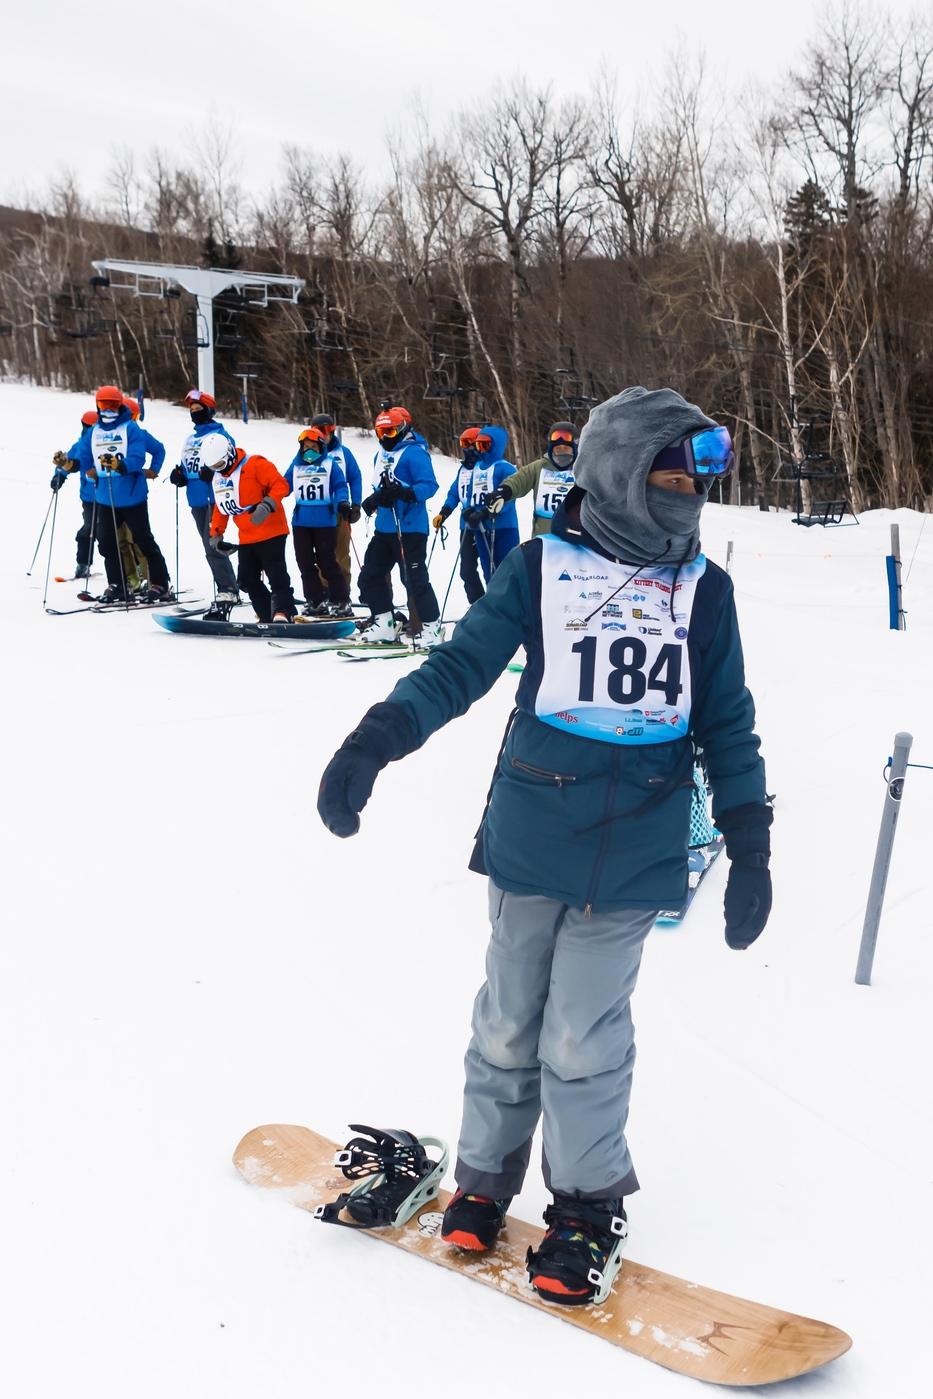 WinterKids Downhill 24 2021 SDP 2883